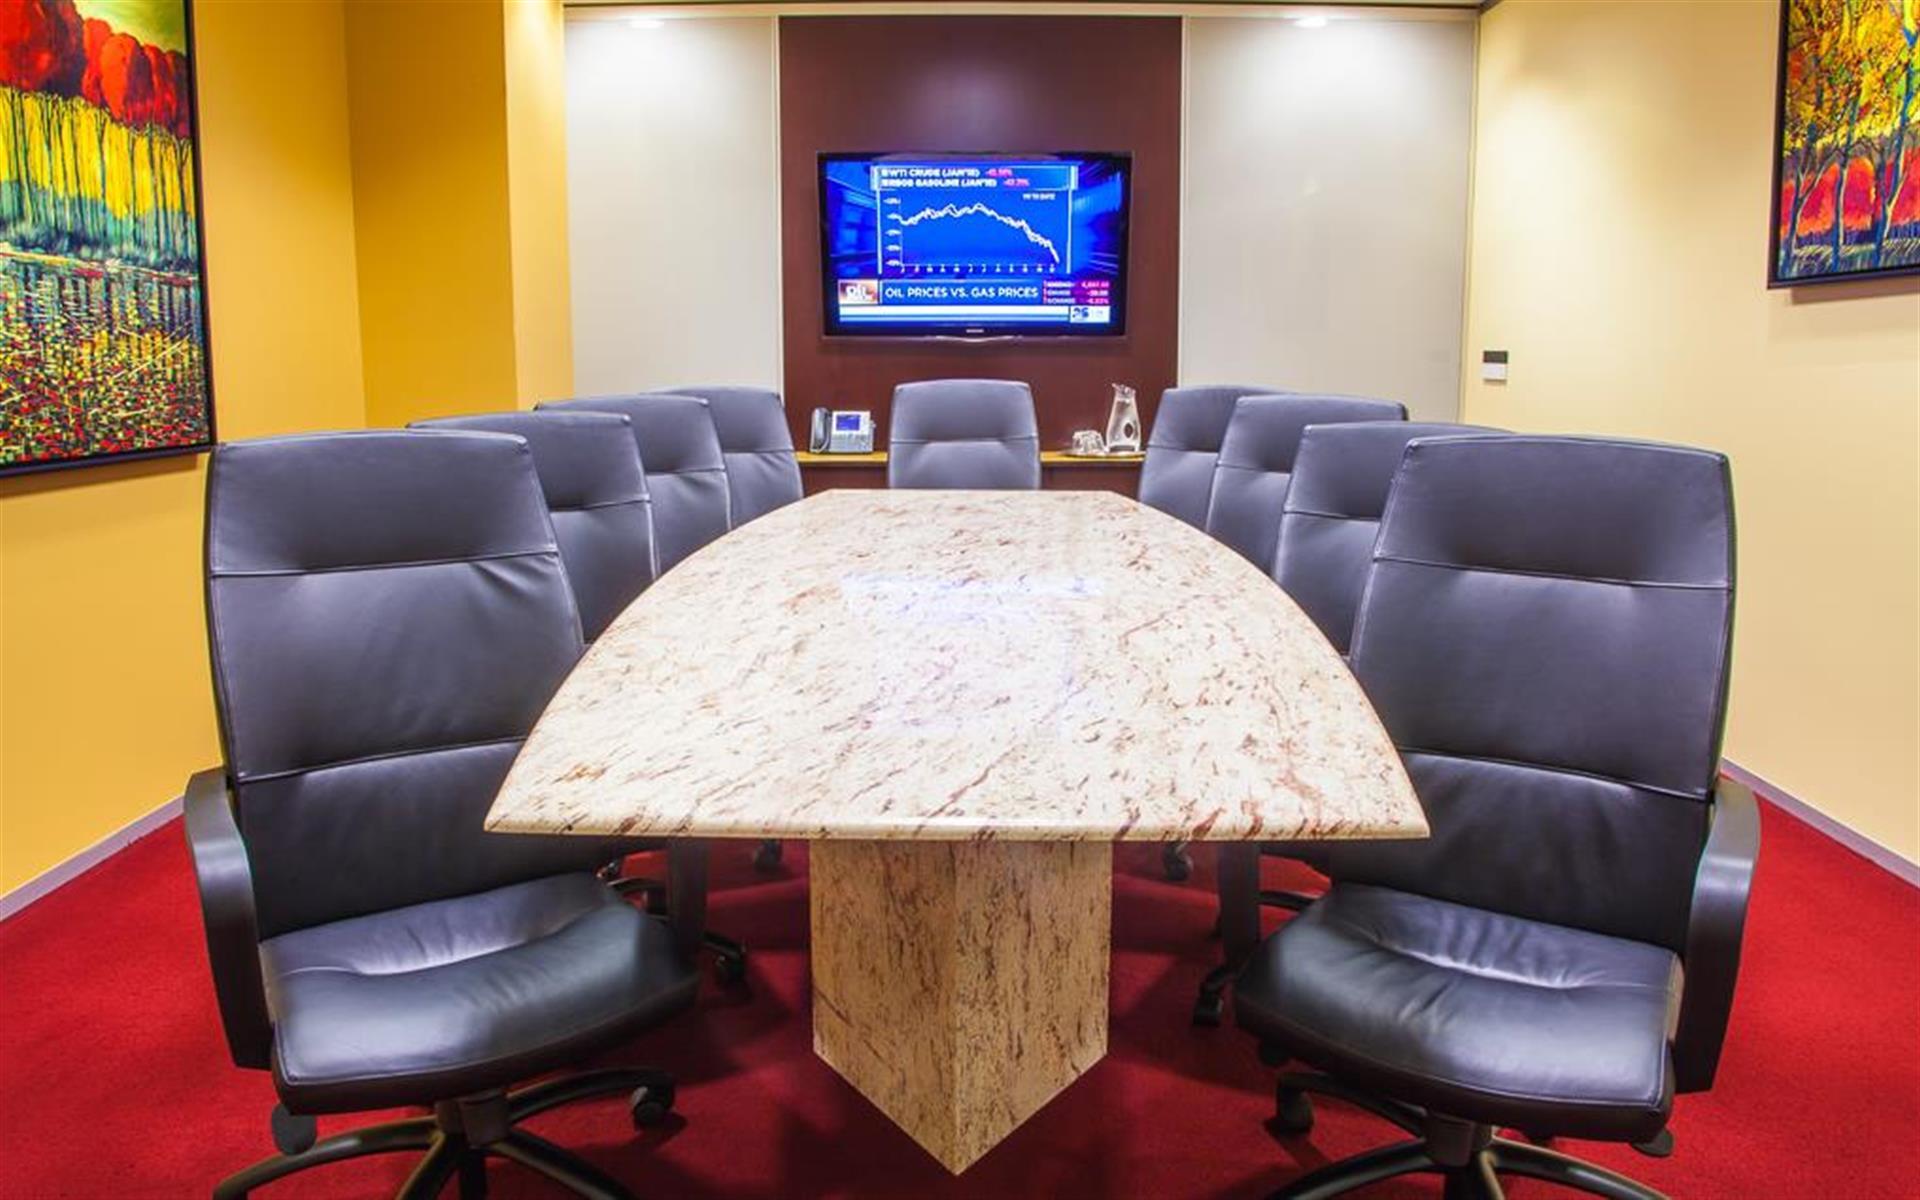 Servcorp - San Francisco 101 California Street - Executive Boardroom 10 people